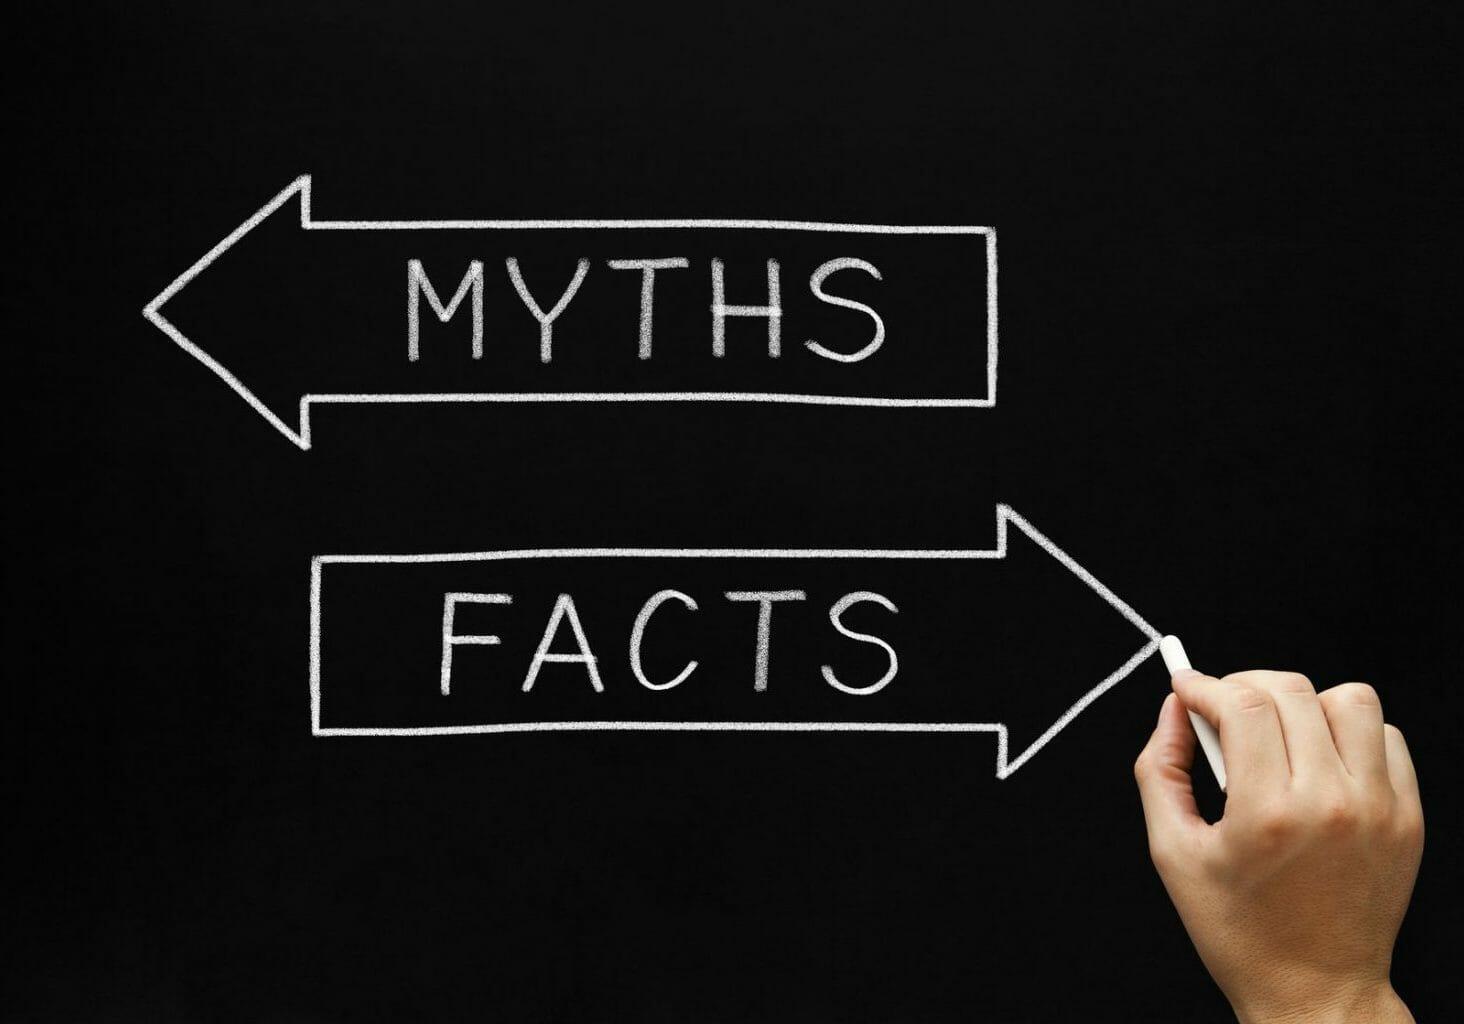 Myths-vs-Facts-1535x1024